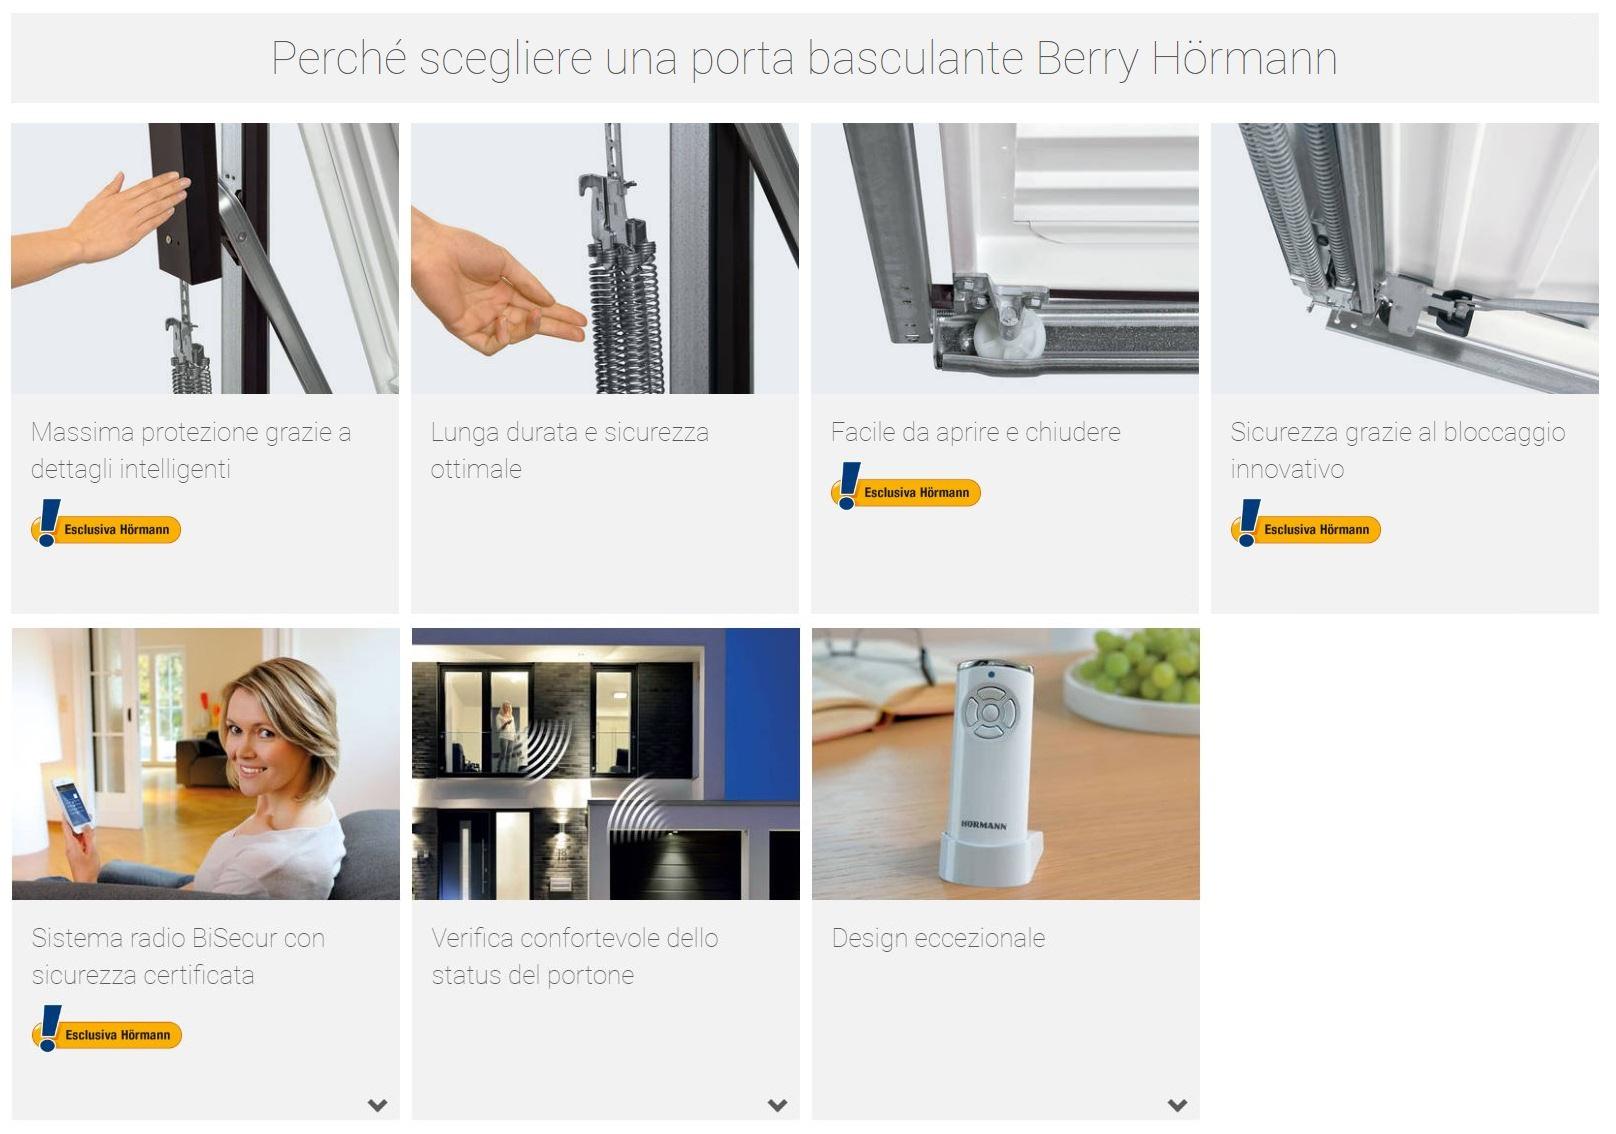 Schemi Elettrici Hormann : Porta basculante berry mod. n80 motivo 902 in pronta consegna mis. l